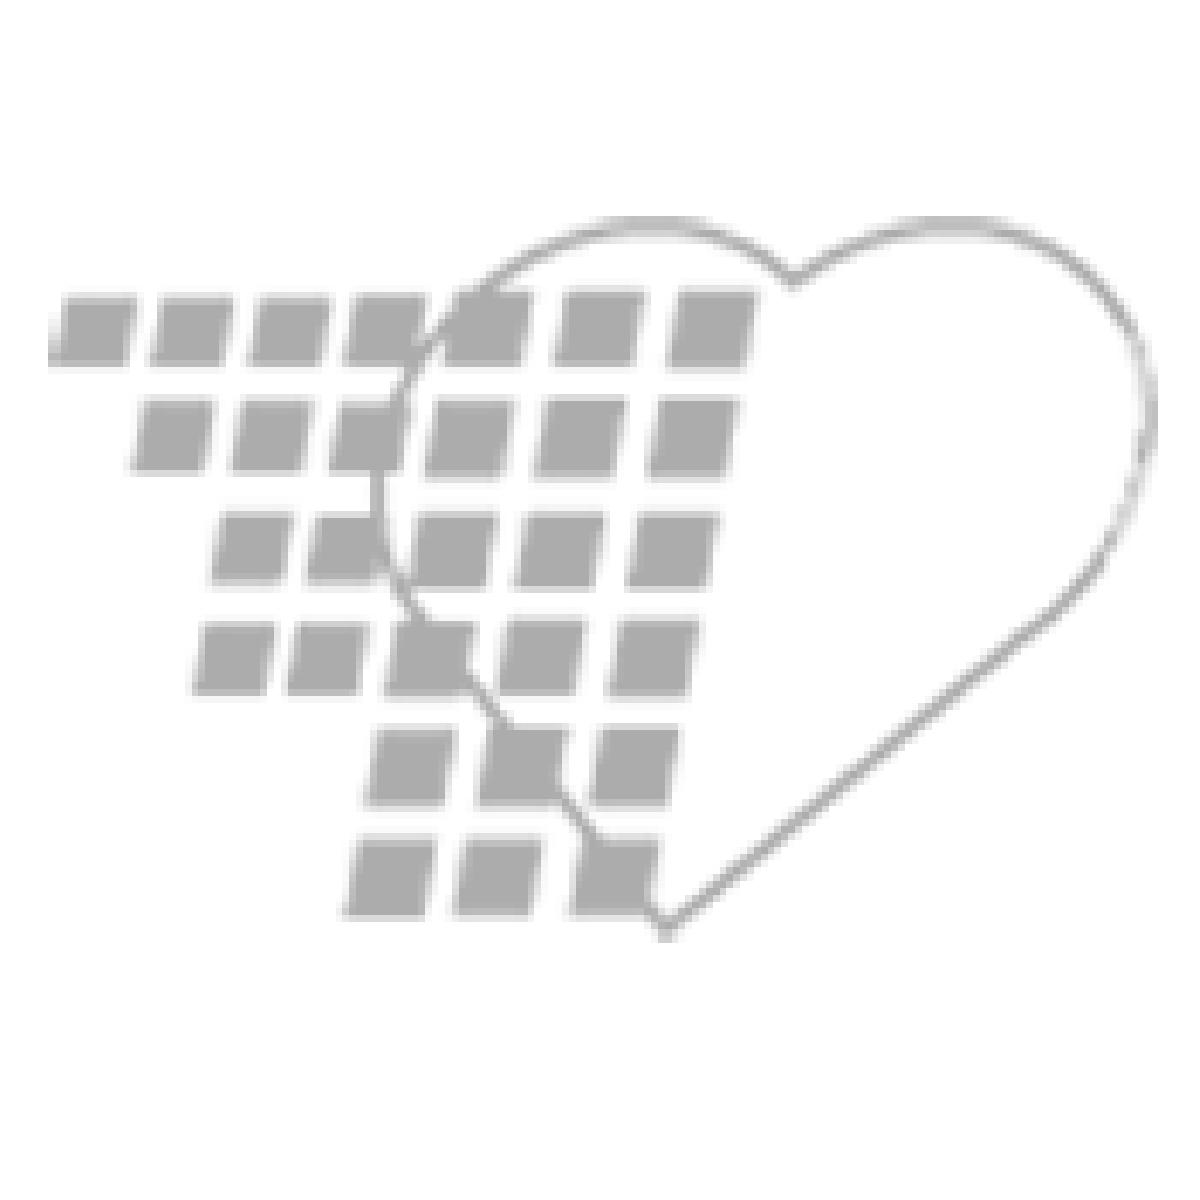 11-81-0911-WH Cardionics SAM 3G Student Auscultation Manikin 3rd Generation